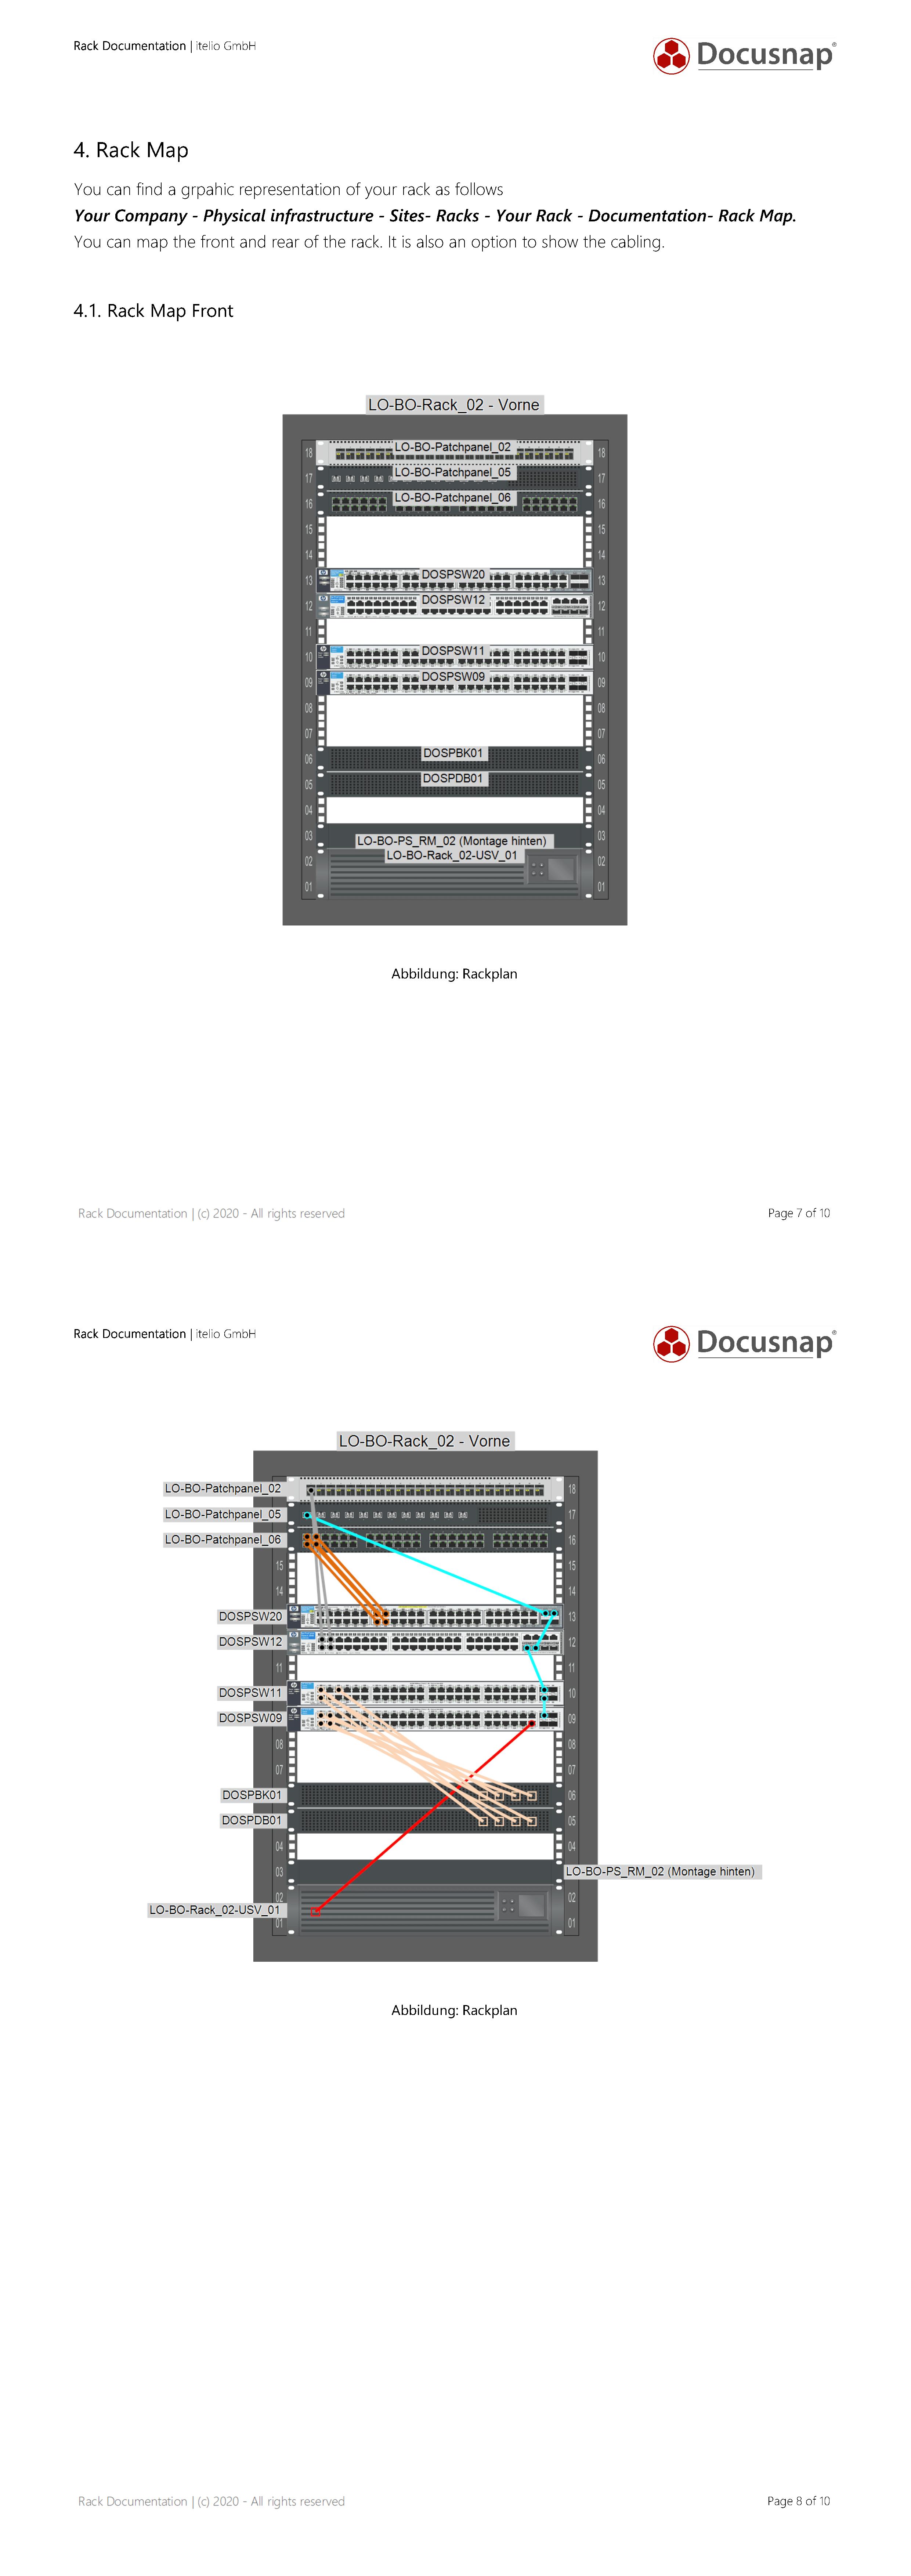 Screenshot: Documentation of a rack